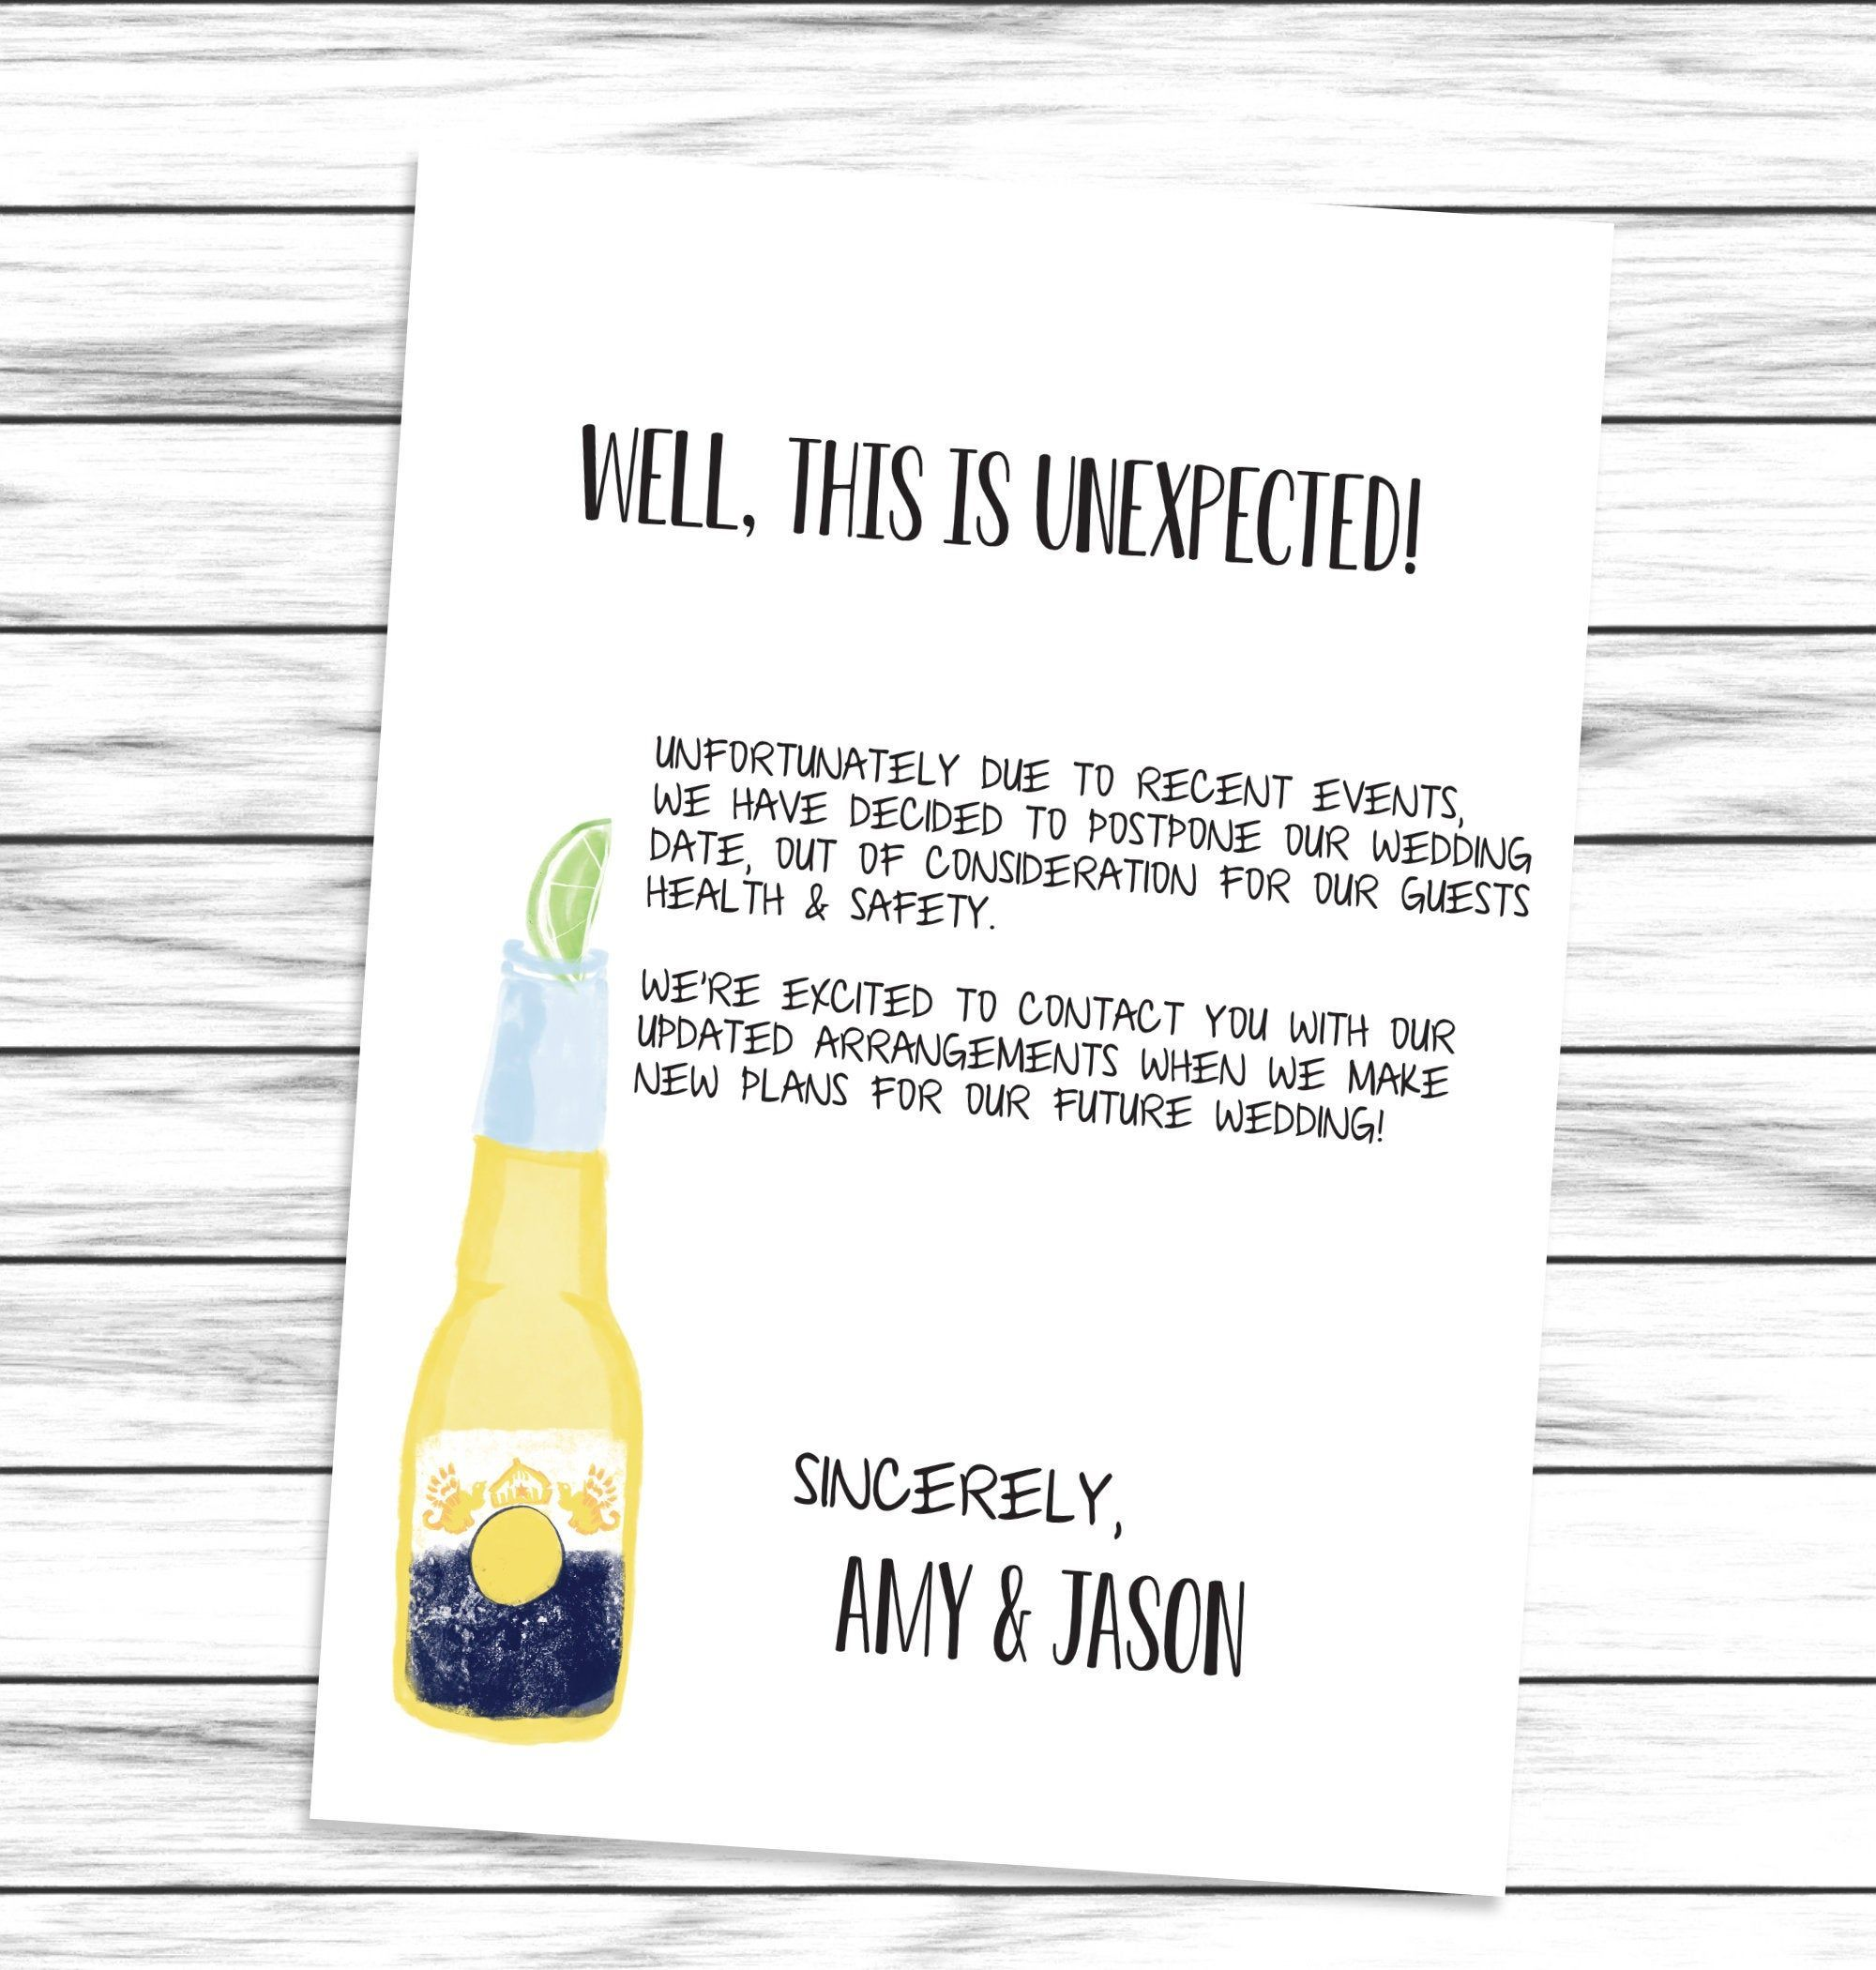 Announcement Change the Date Wedding Postponement Download Digital Template Wedding Cancellation Printable